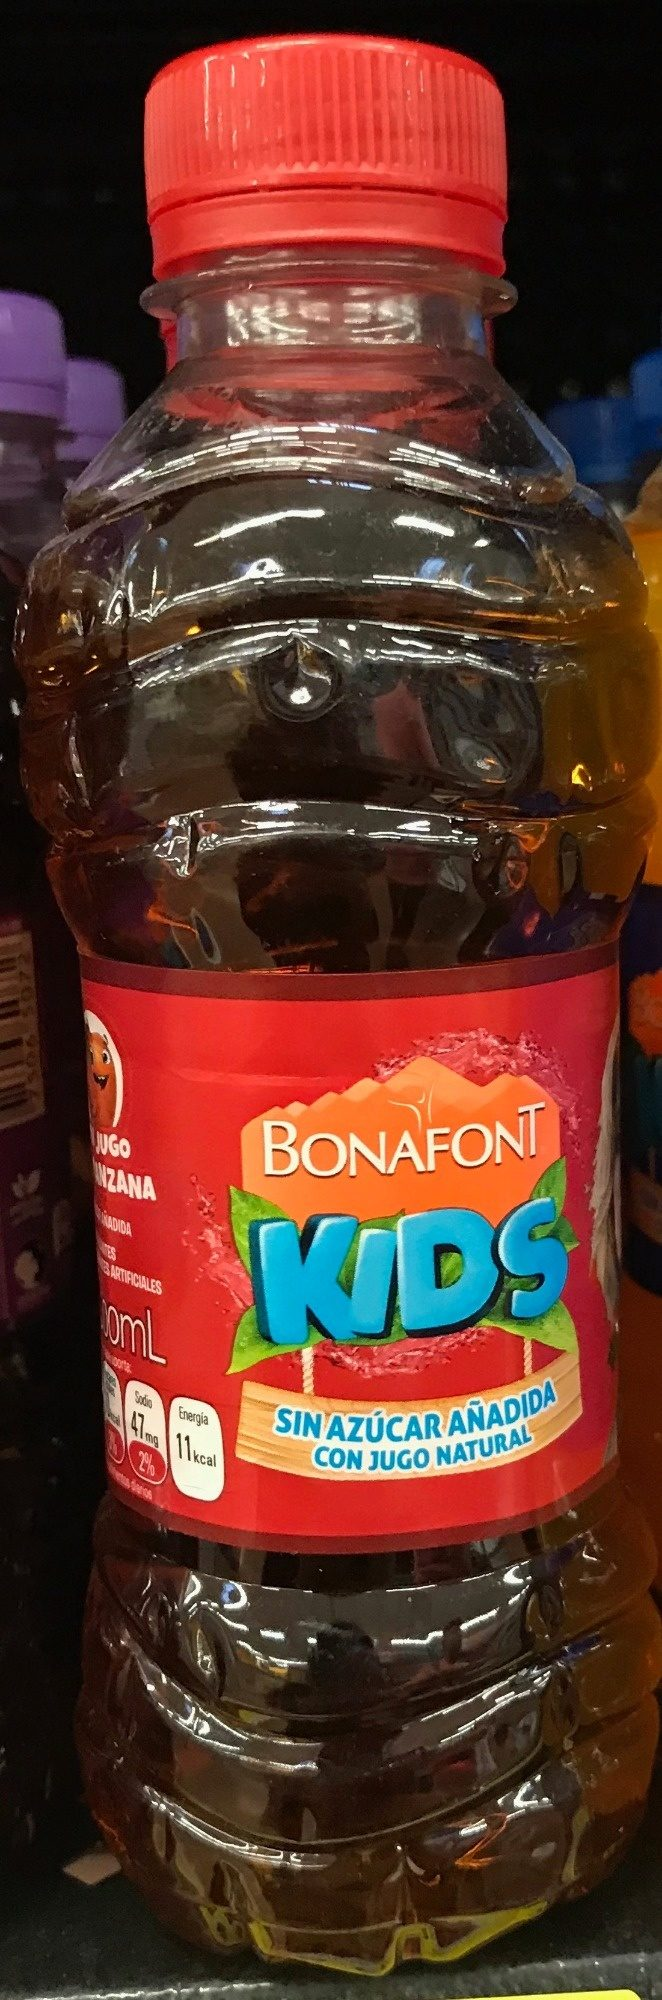 Bonafont Kids Sabor Manzana - Product - es